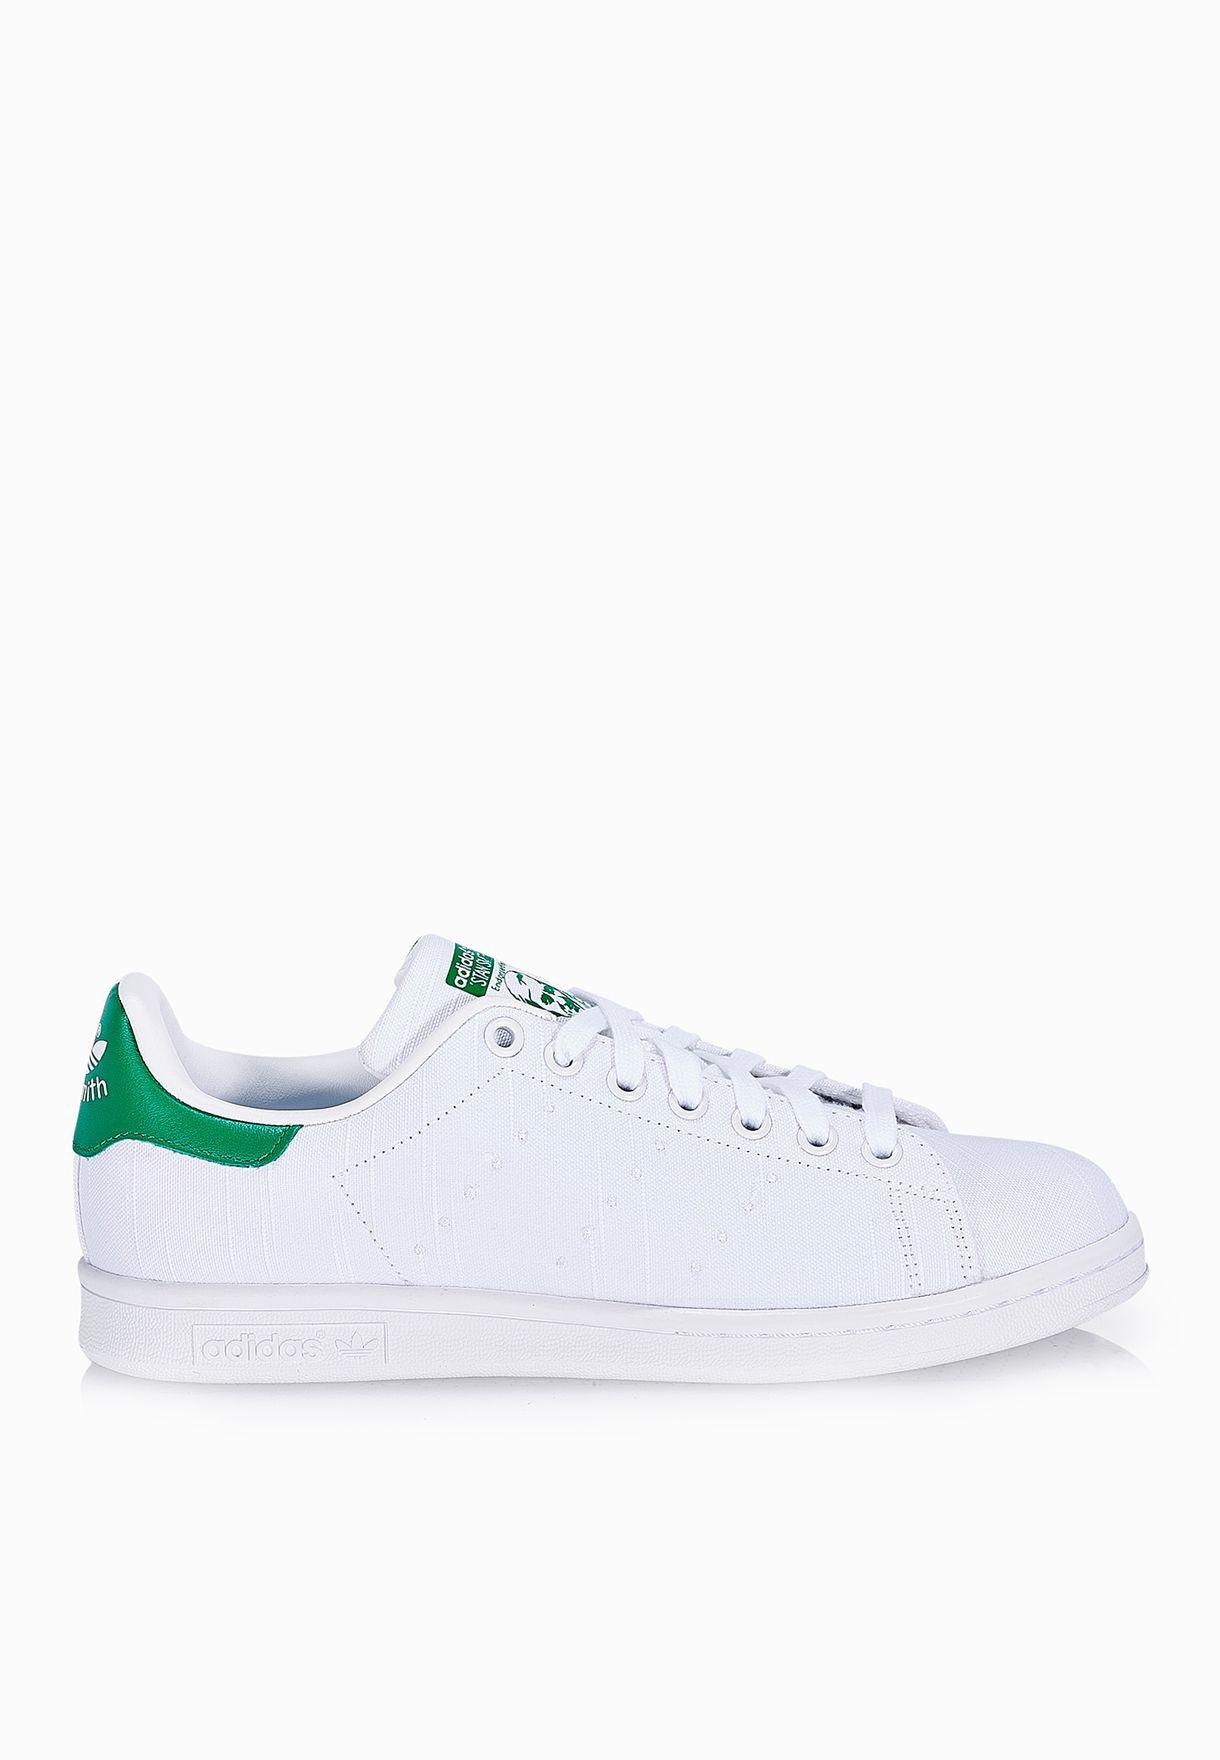 premium selection 3de89 0b48d Shop adidas Originals white Stan SMith S75560 for Women in U